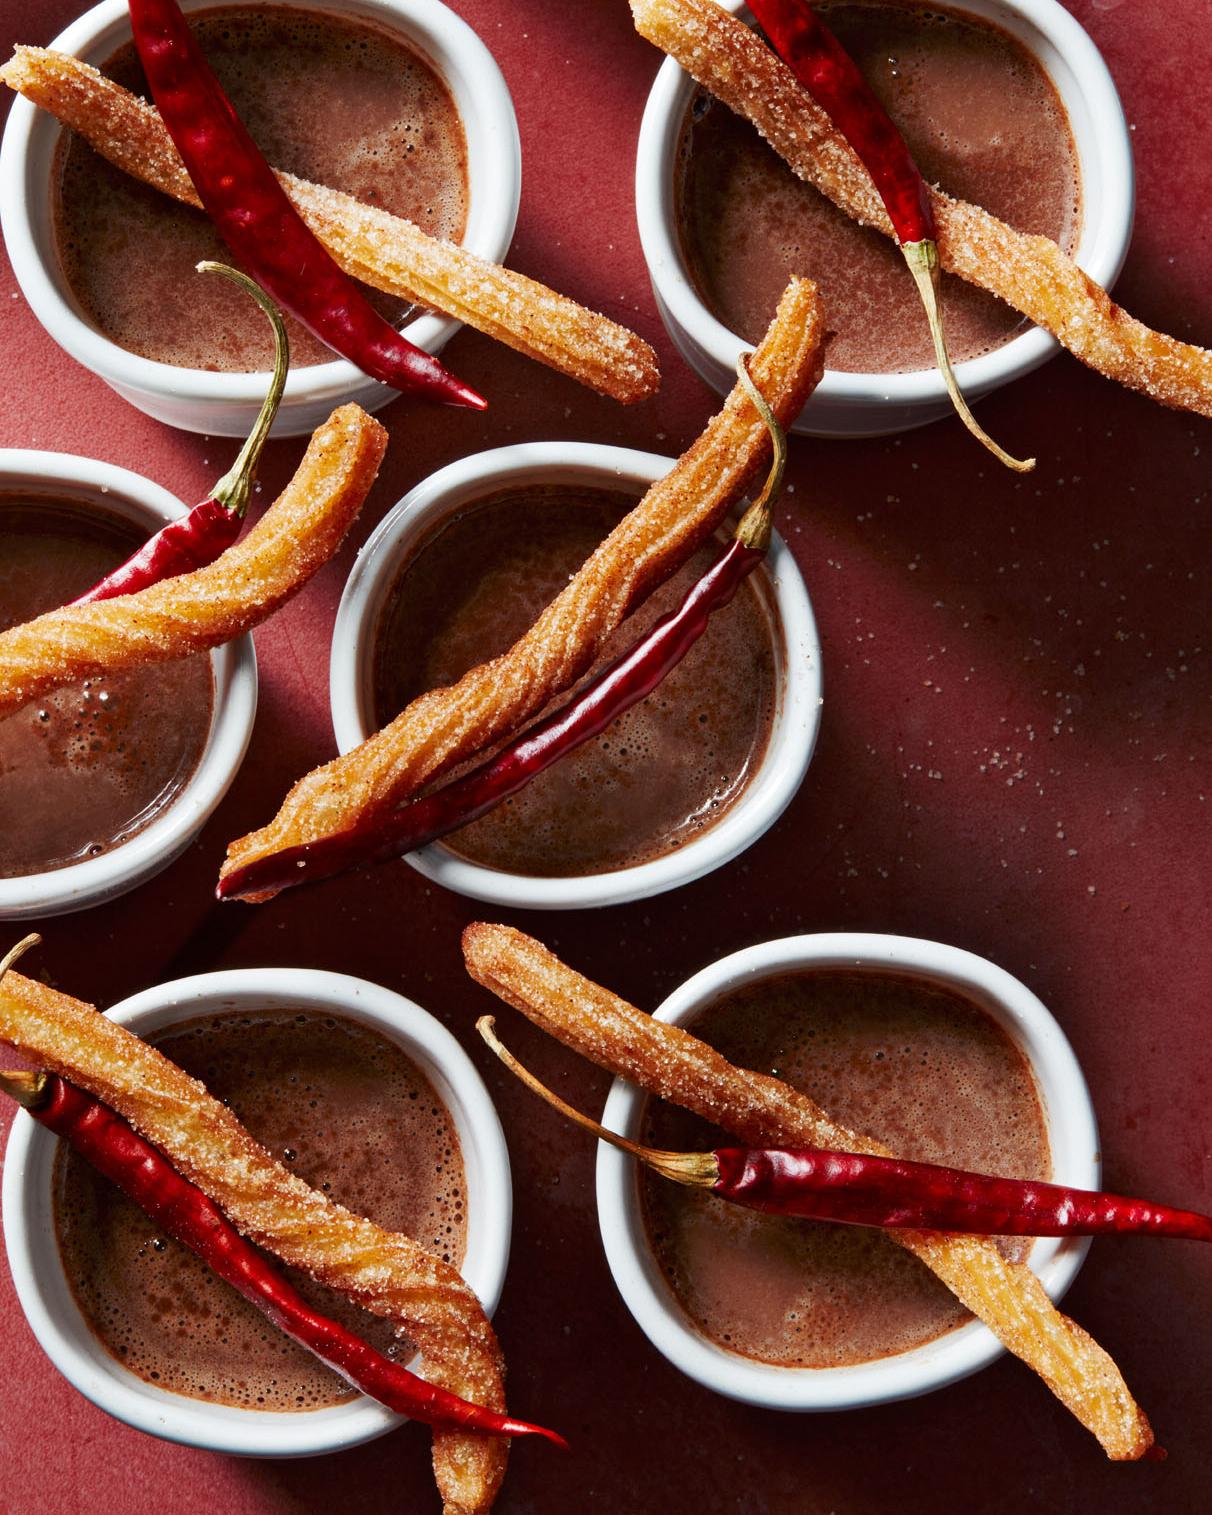 fall-dessert-spiced-churros-with-mexican-hot-chocolate-hero-d113106.jpg